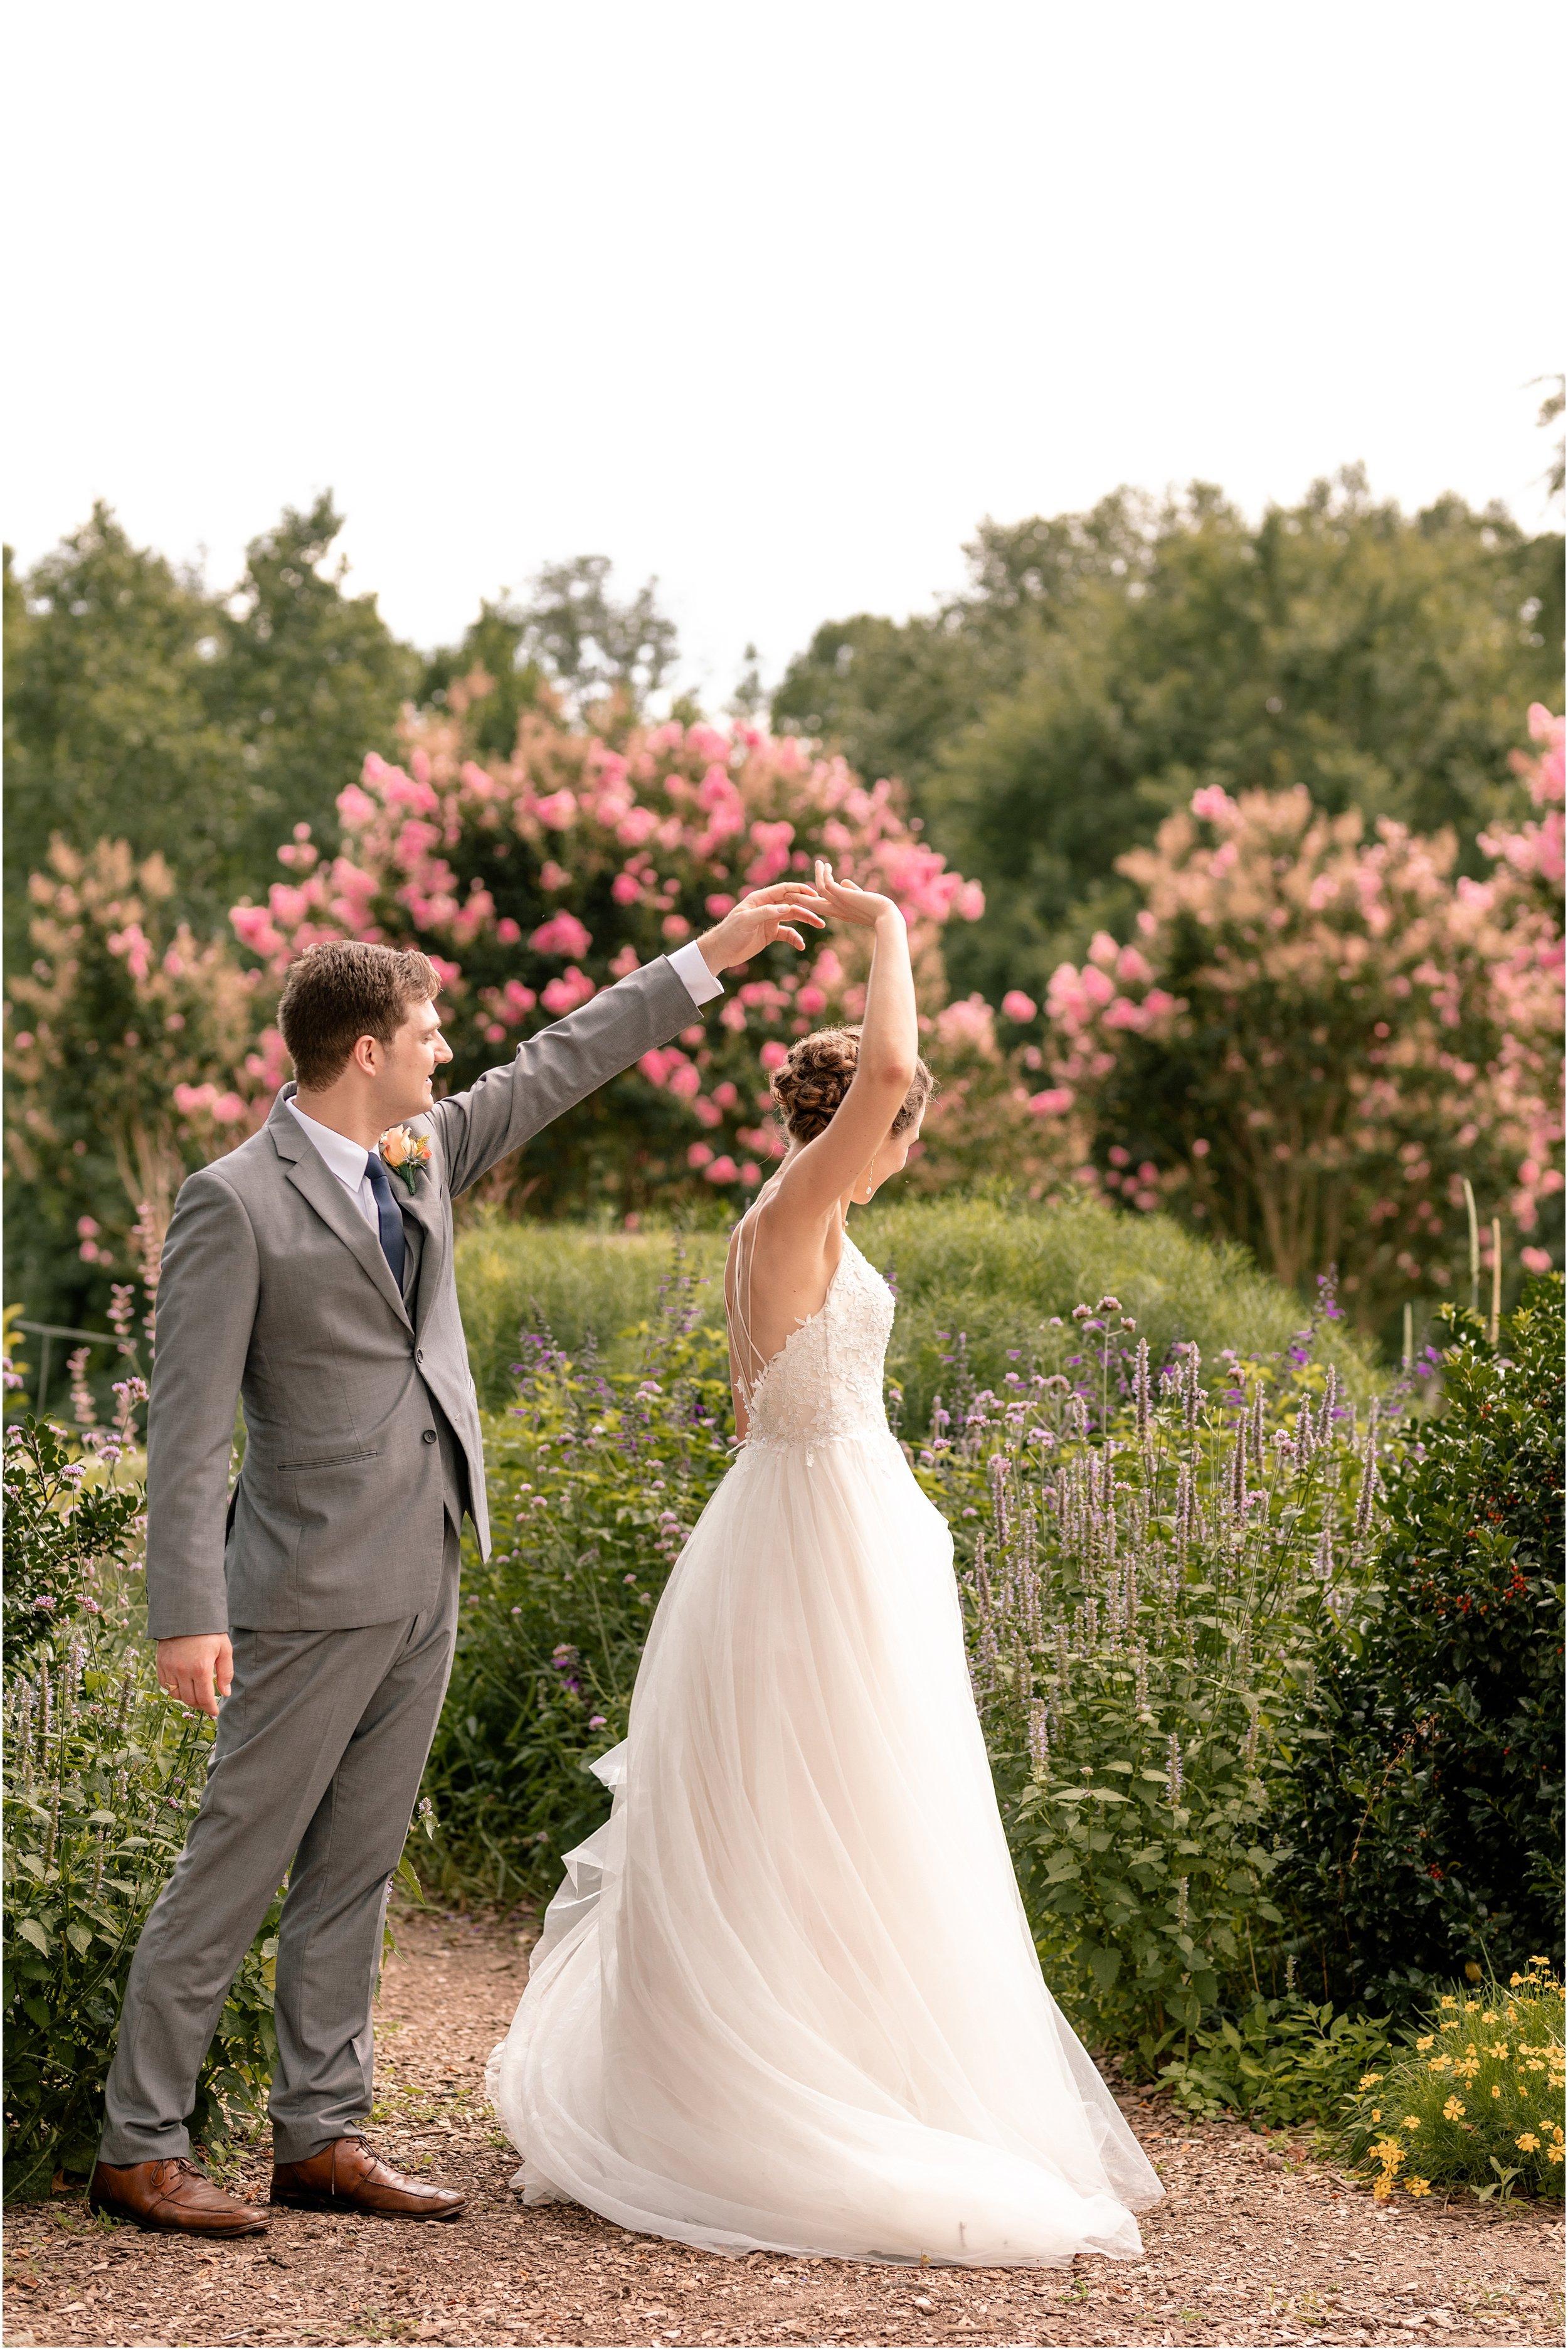 hannah leigh photography Cylburn Arboretum Wedding Baltimore, MD_3424.jpg